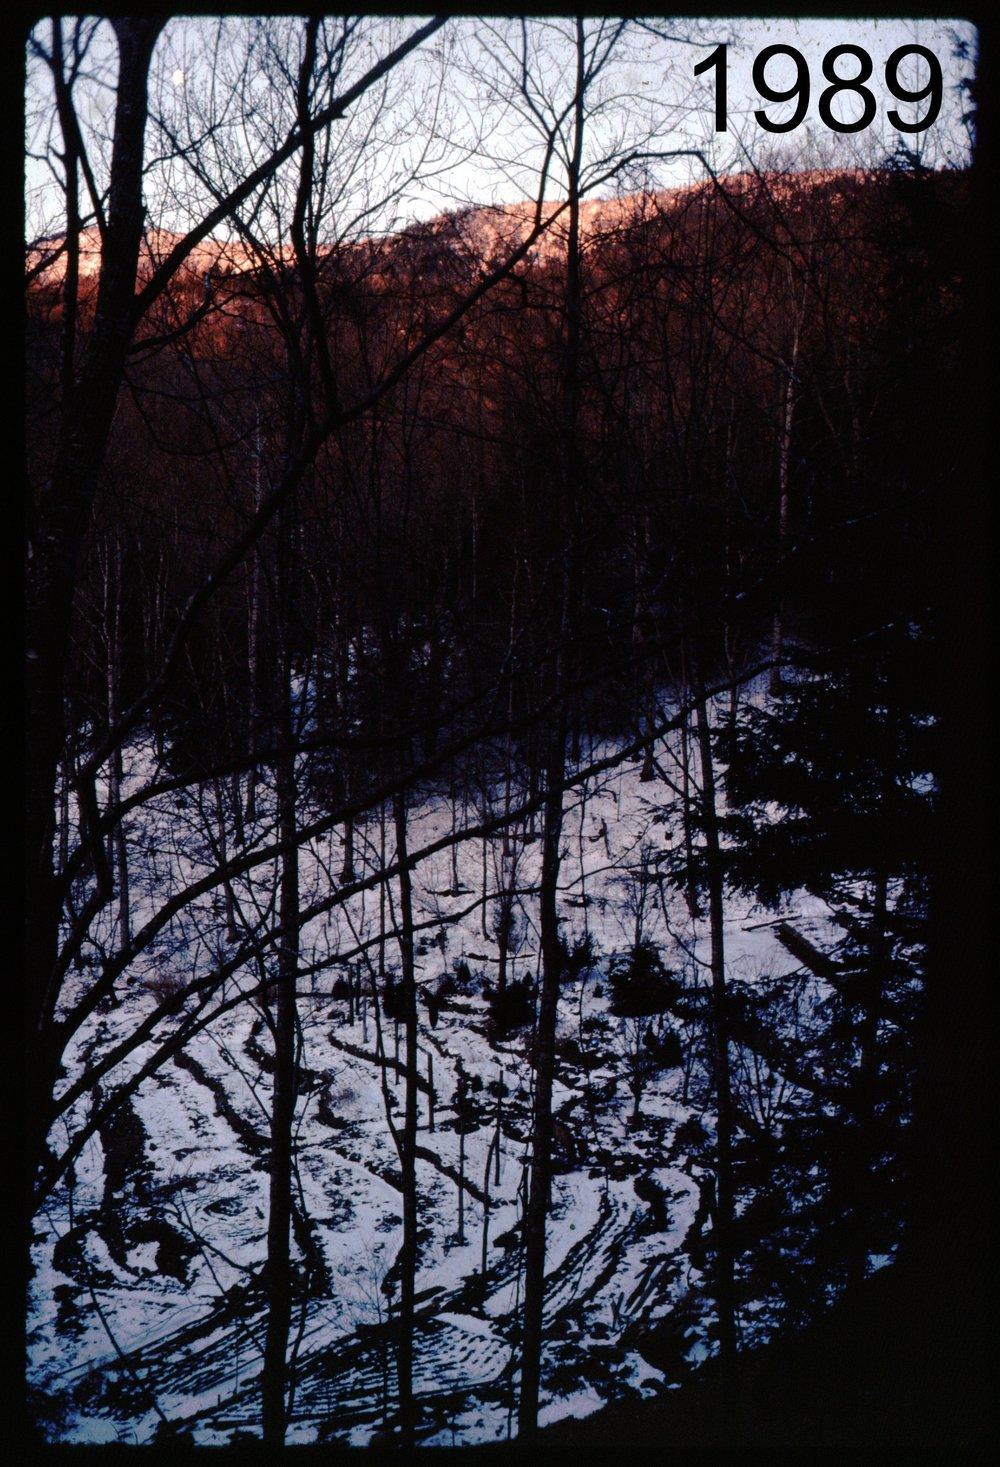 1989 house-Blacks snow.jpg